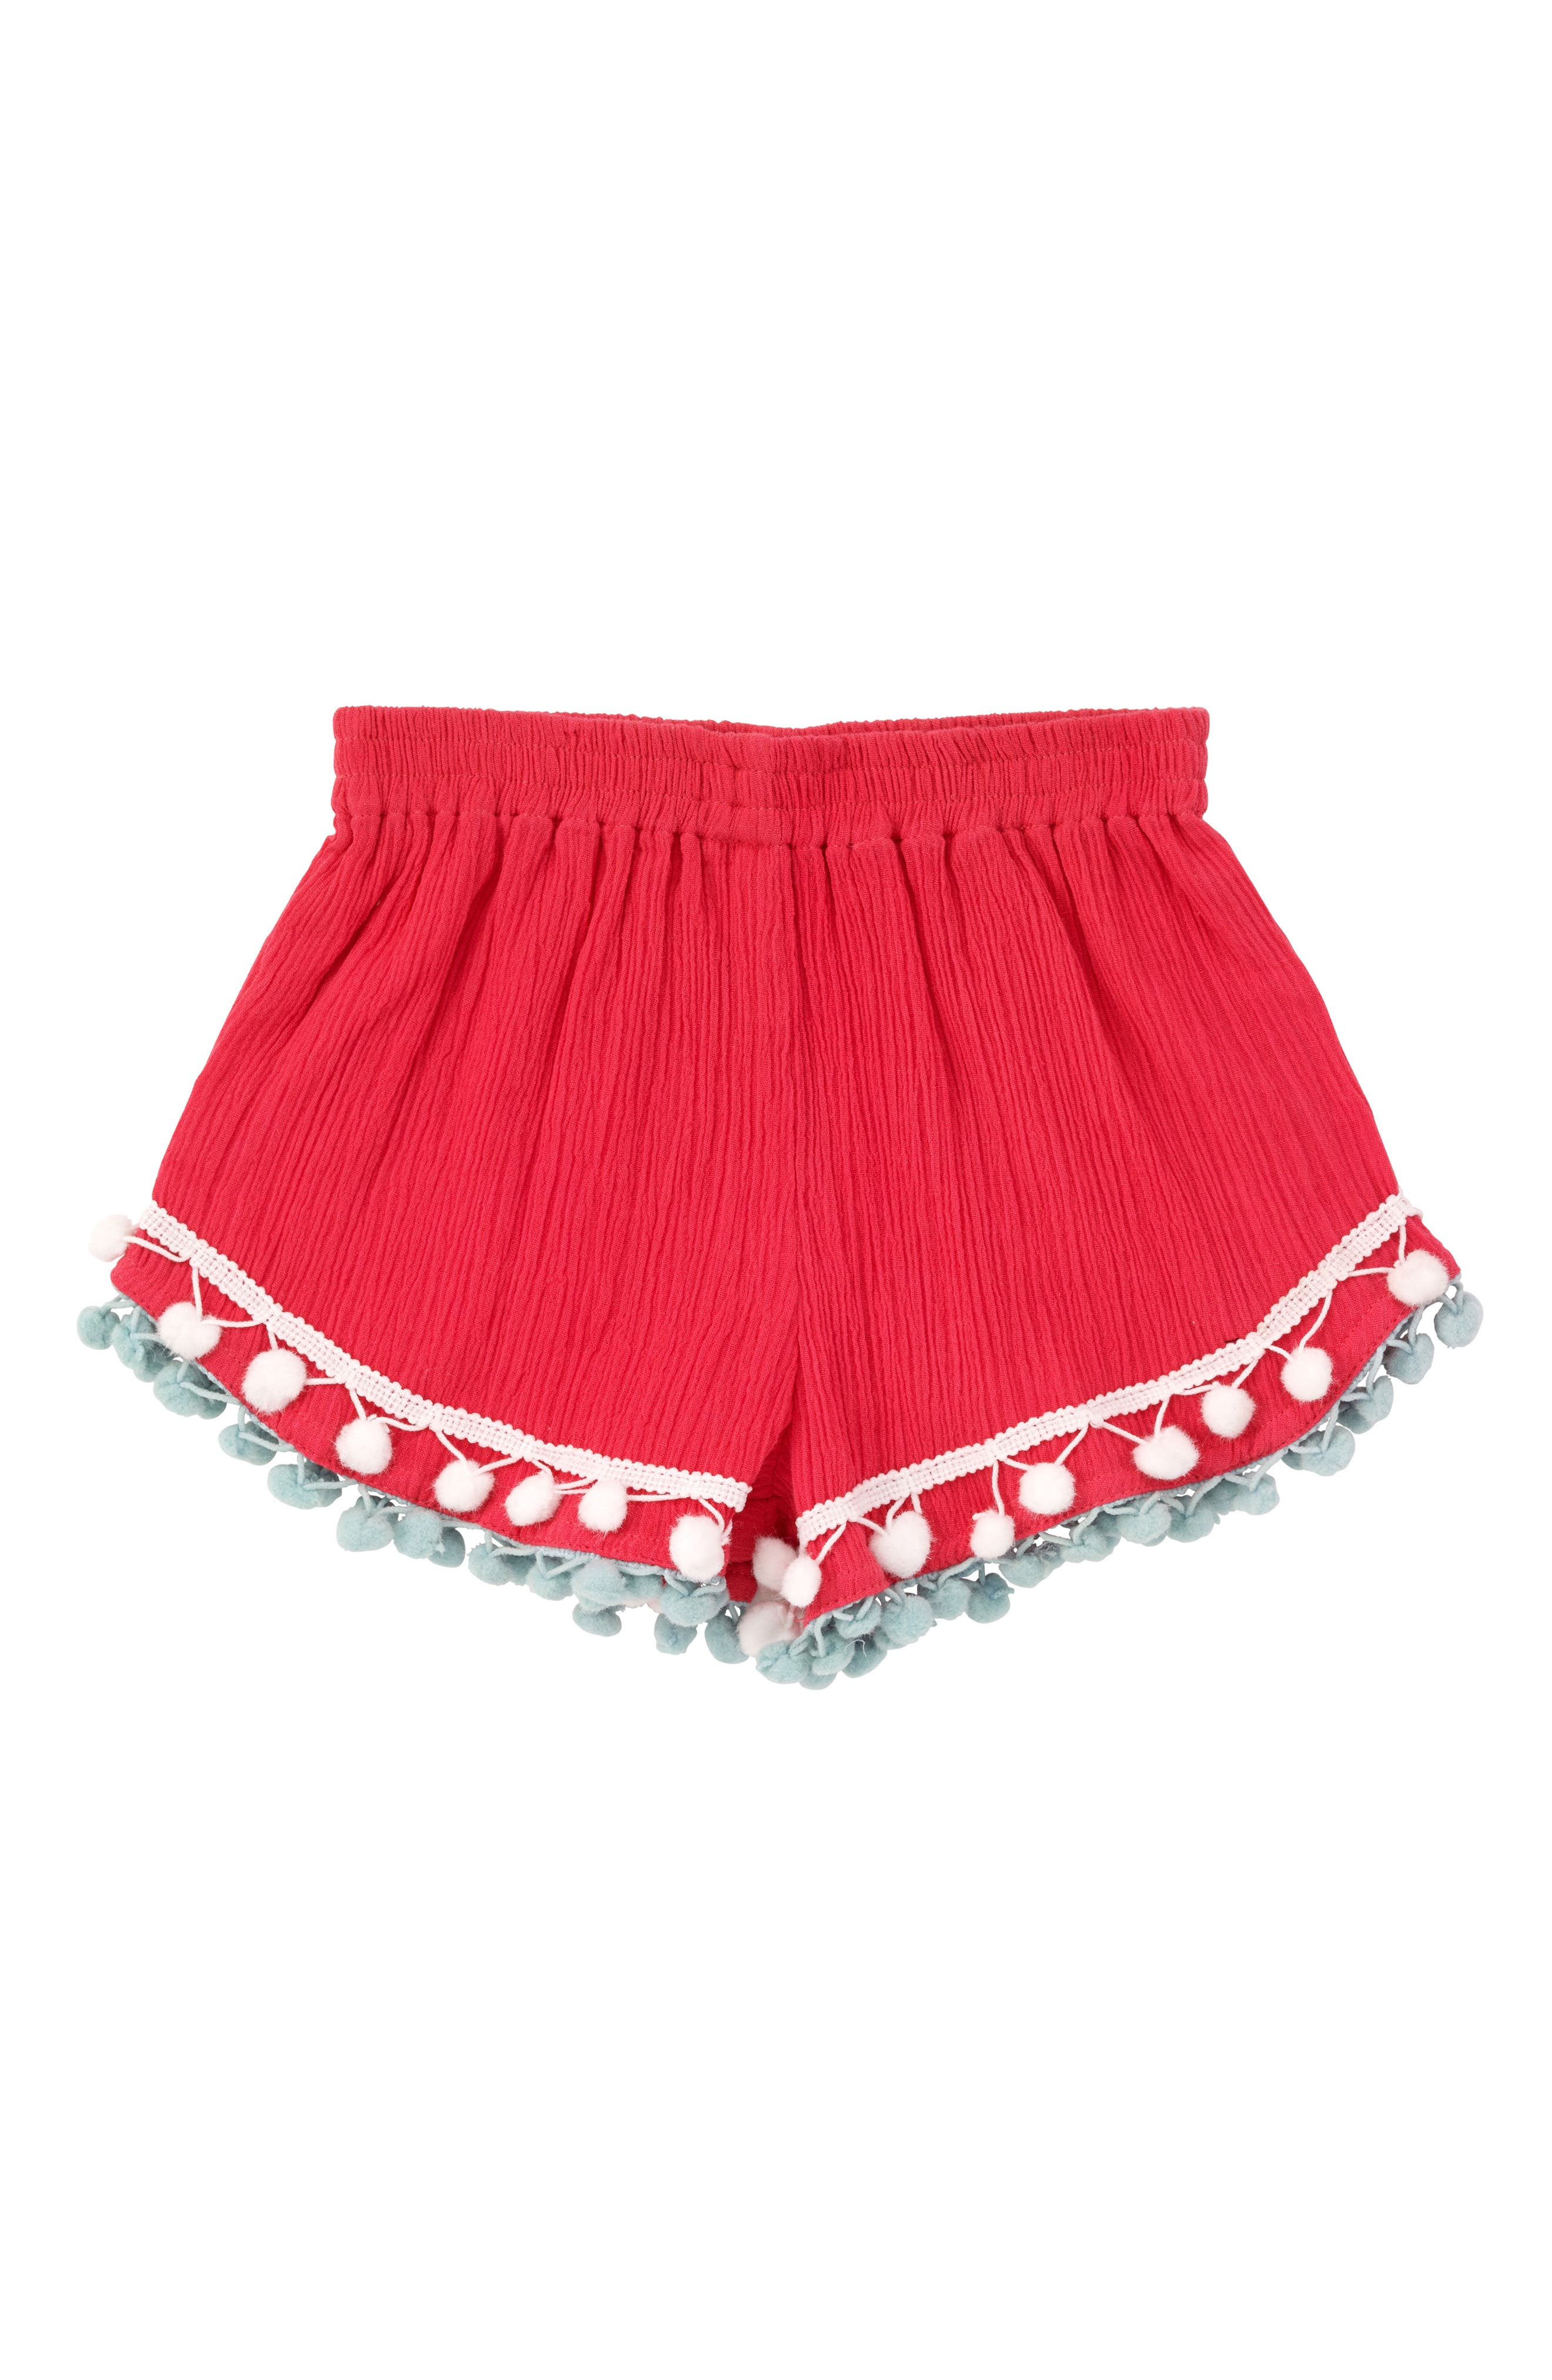 Pompom Shorts,                         Main,                         color, Coral